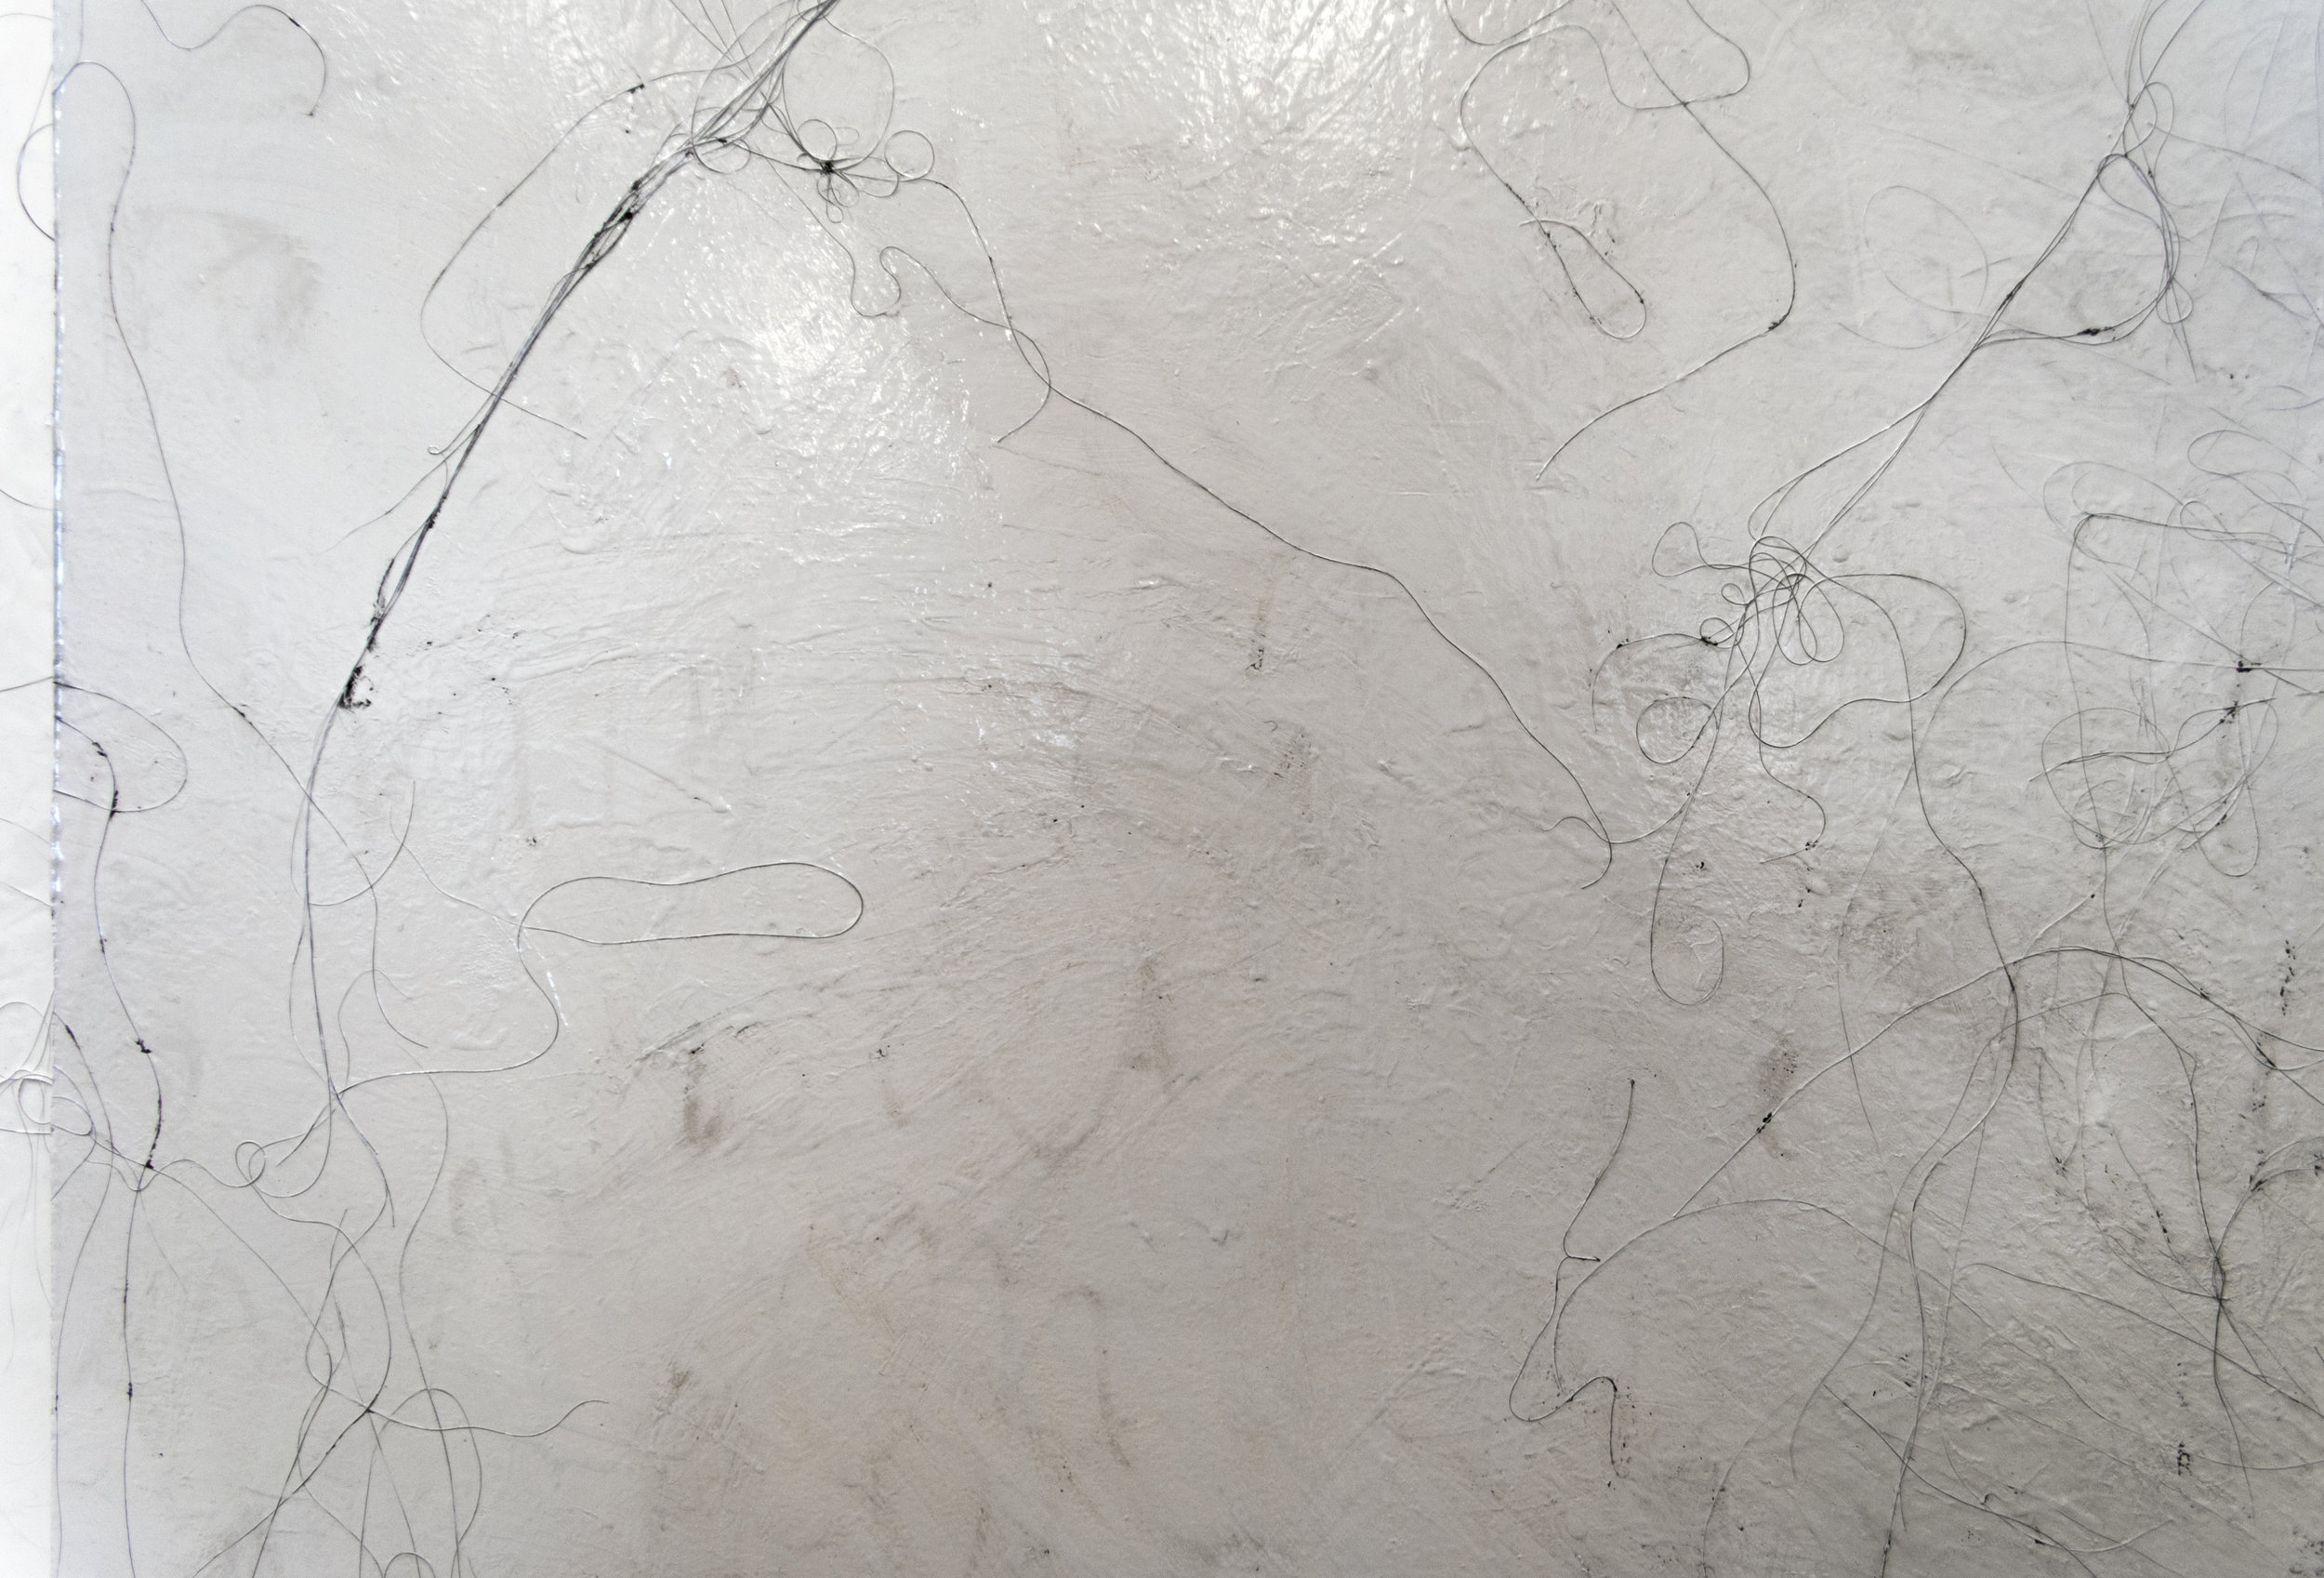 2018 48x48 whiteboard hair ink DETAIL.jpg